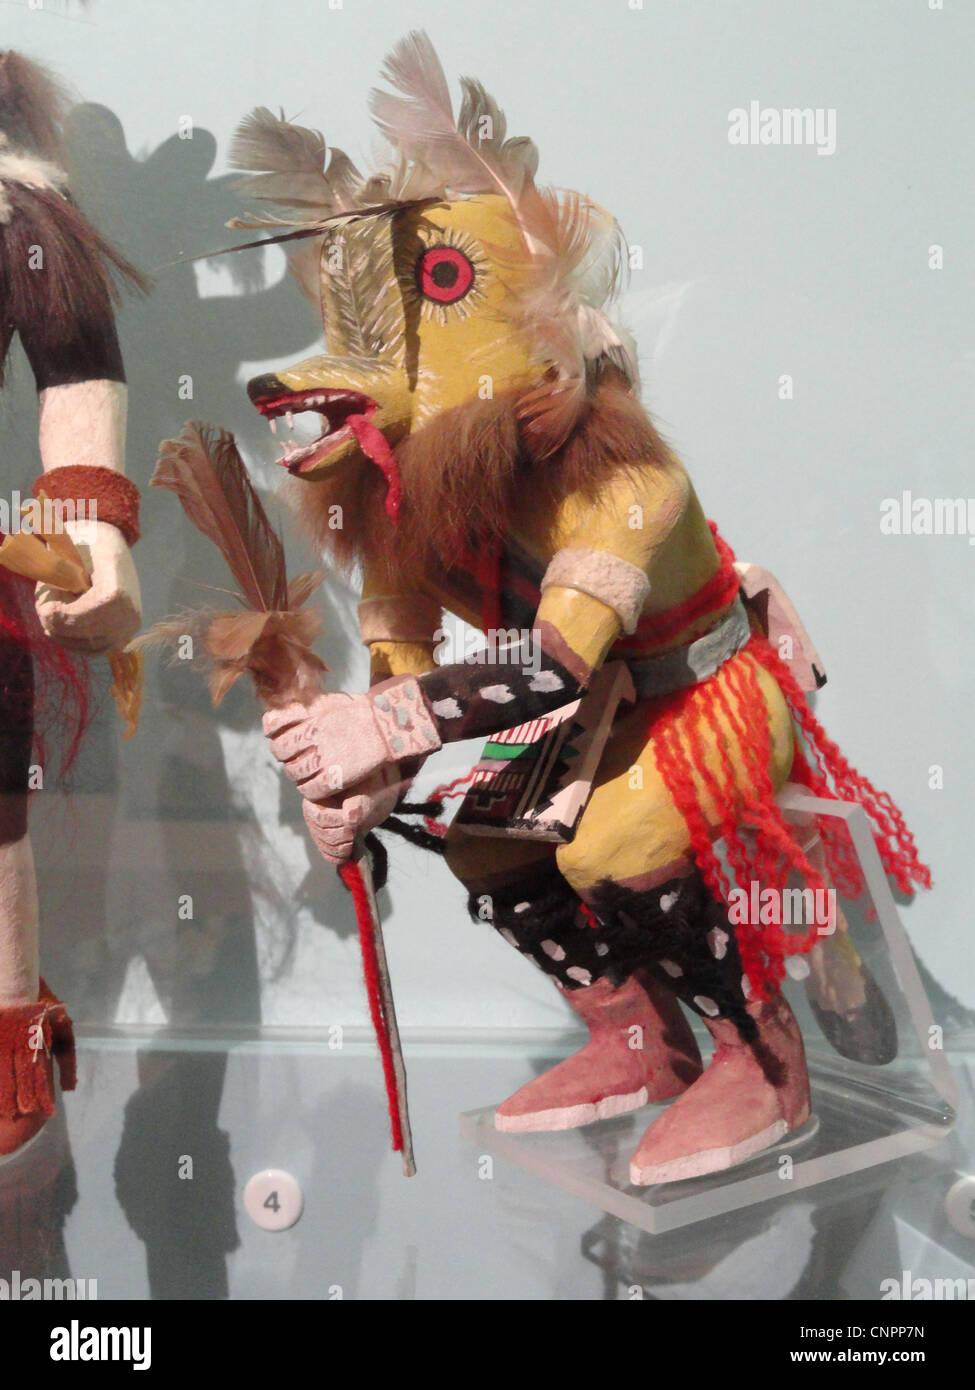 Kwewu, lupo katcina, Hopi, raccolti 1940 - Museo Peabody, Harvard University Immagini Stock